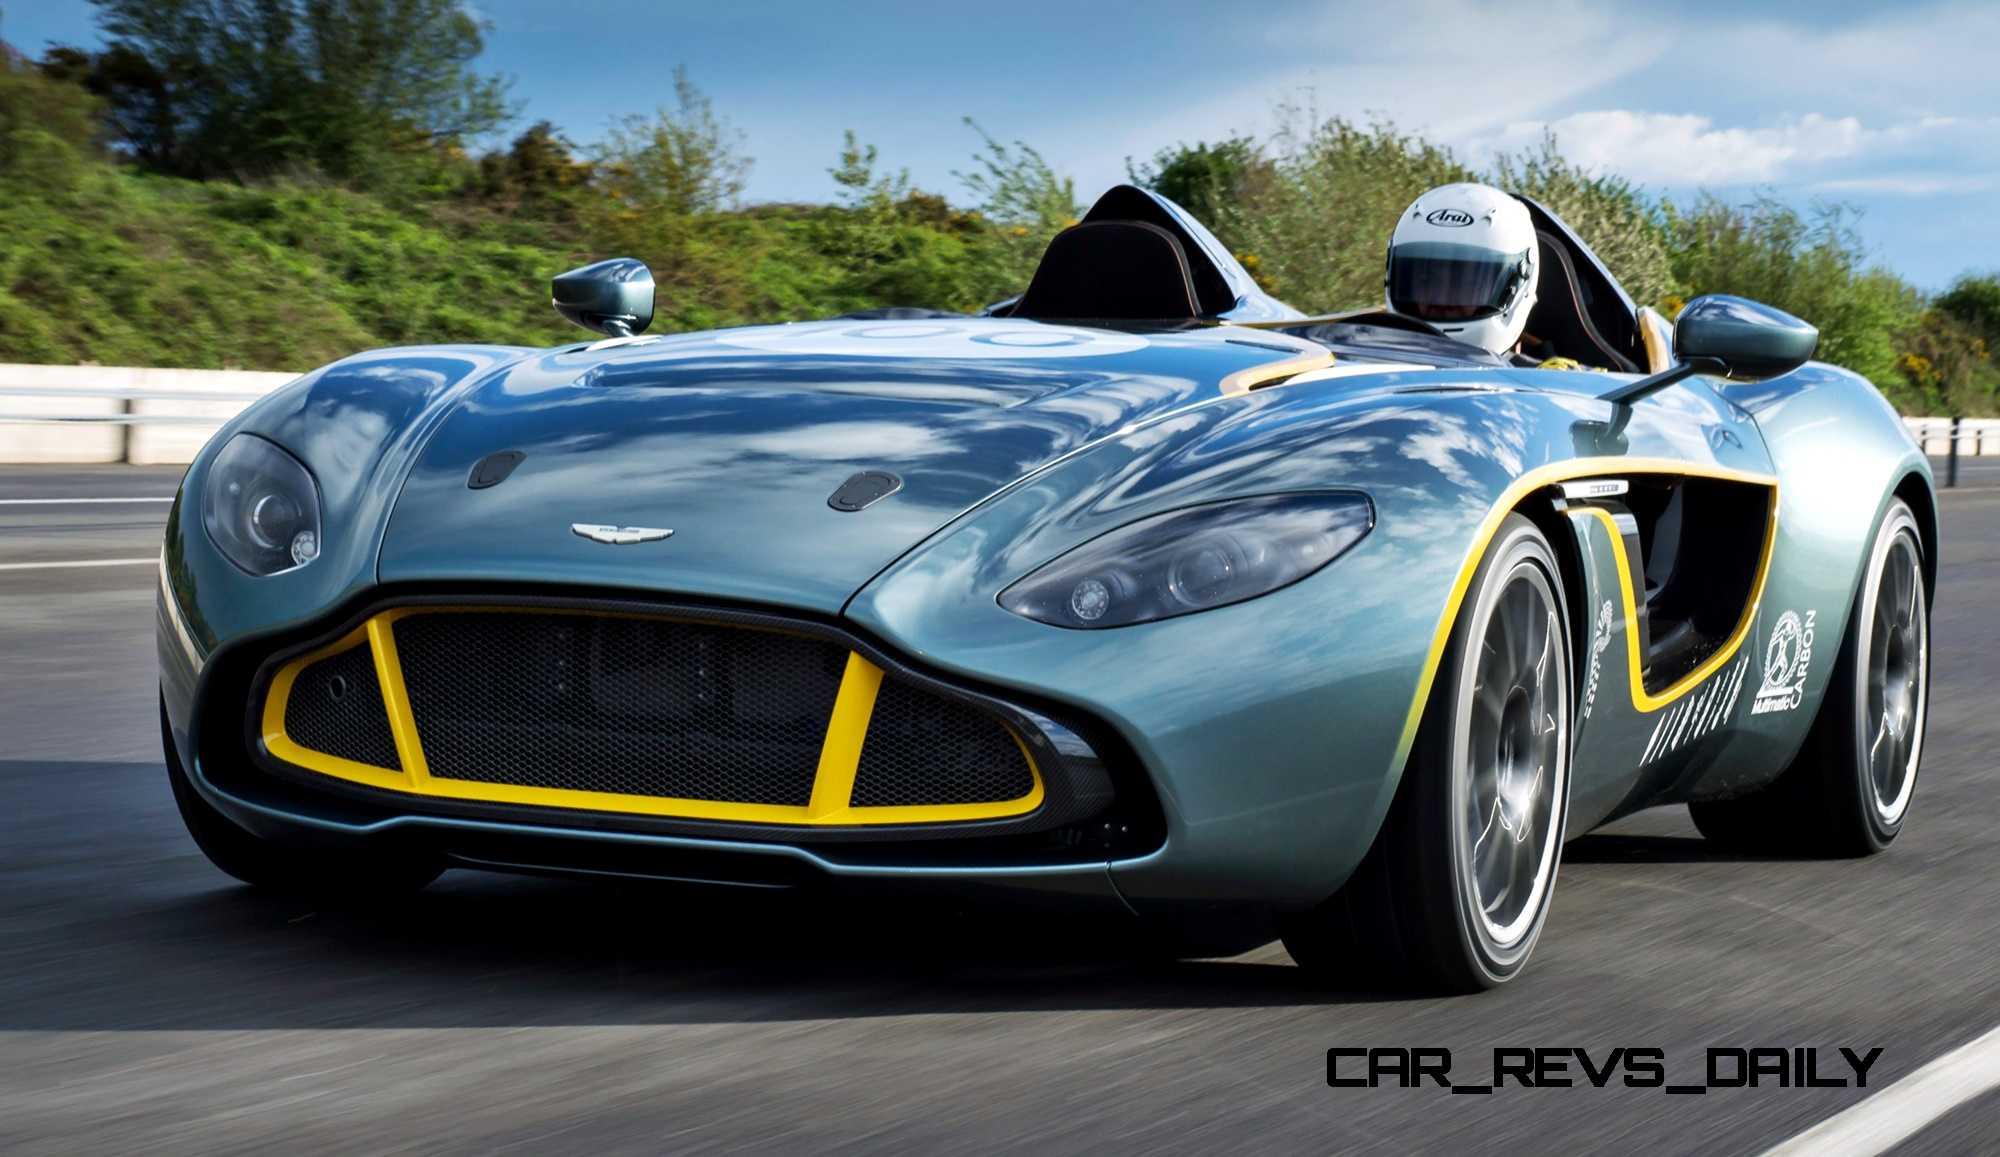 Aston Martin Cc Speedster